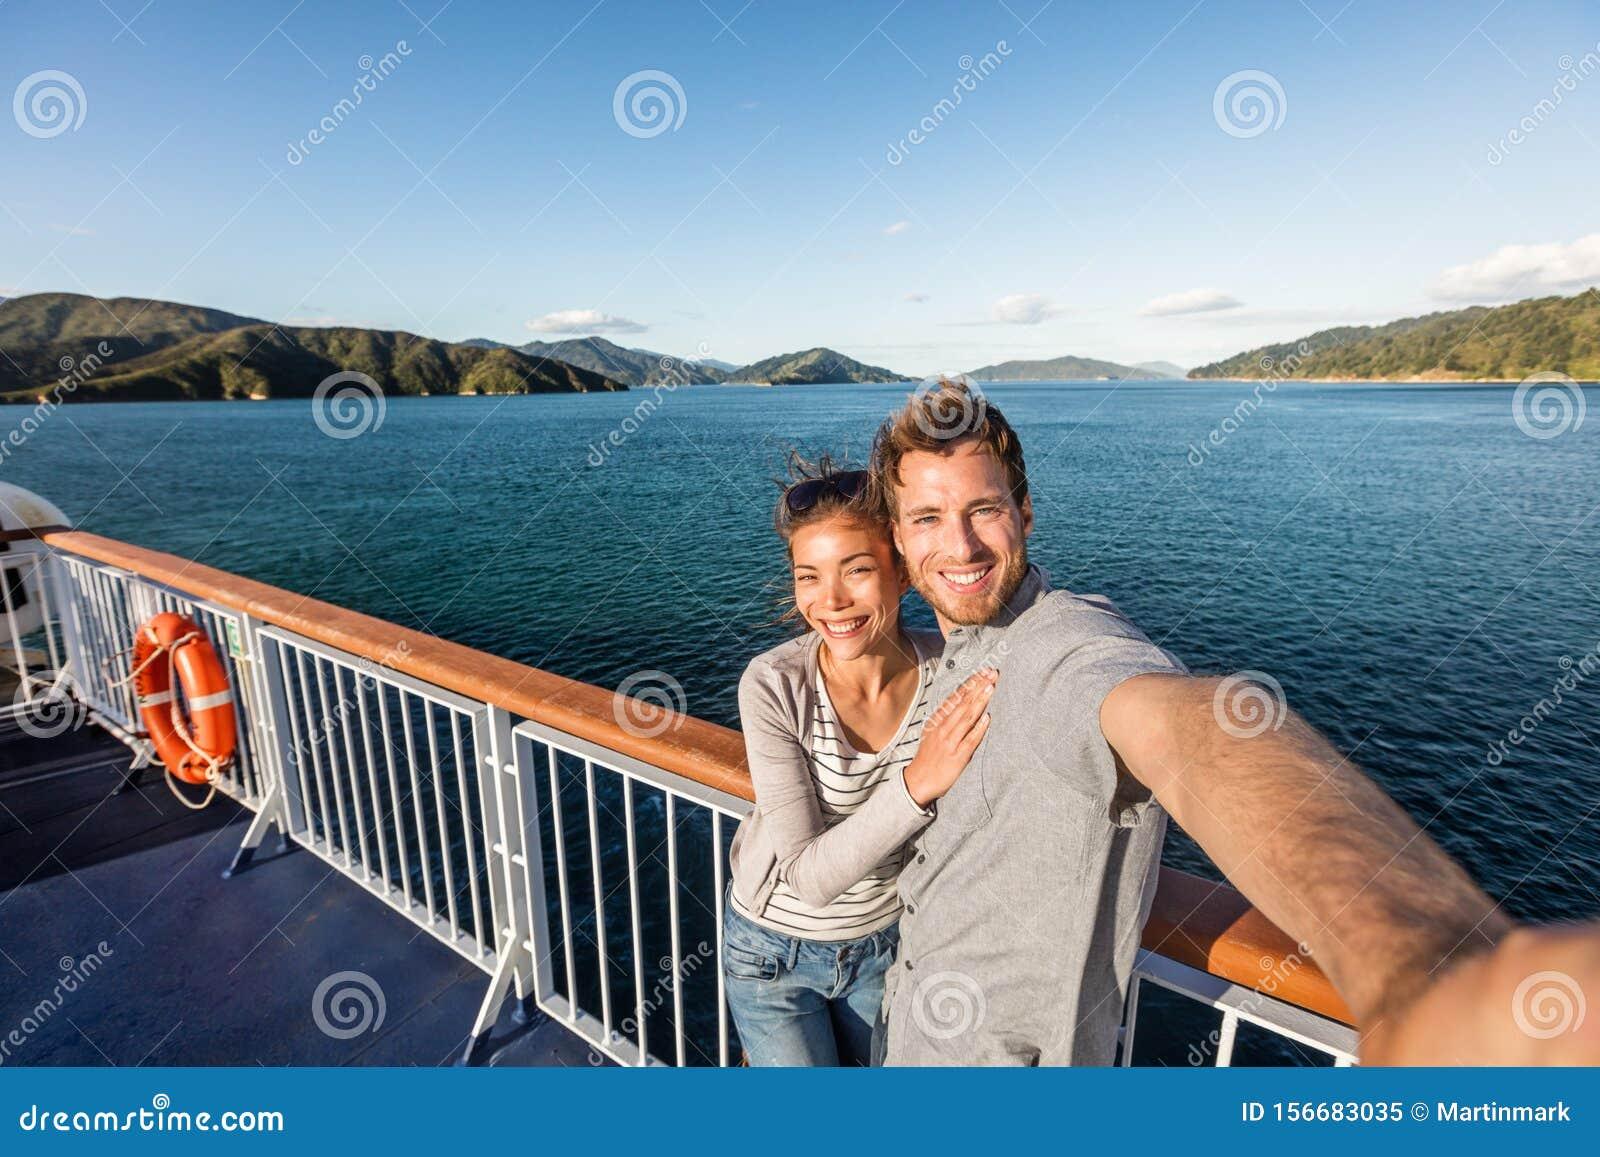 singles meldorf single veranstaltungen saarland